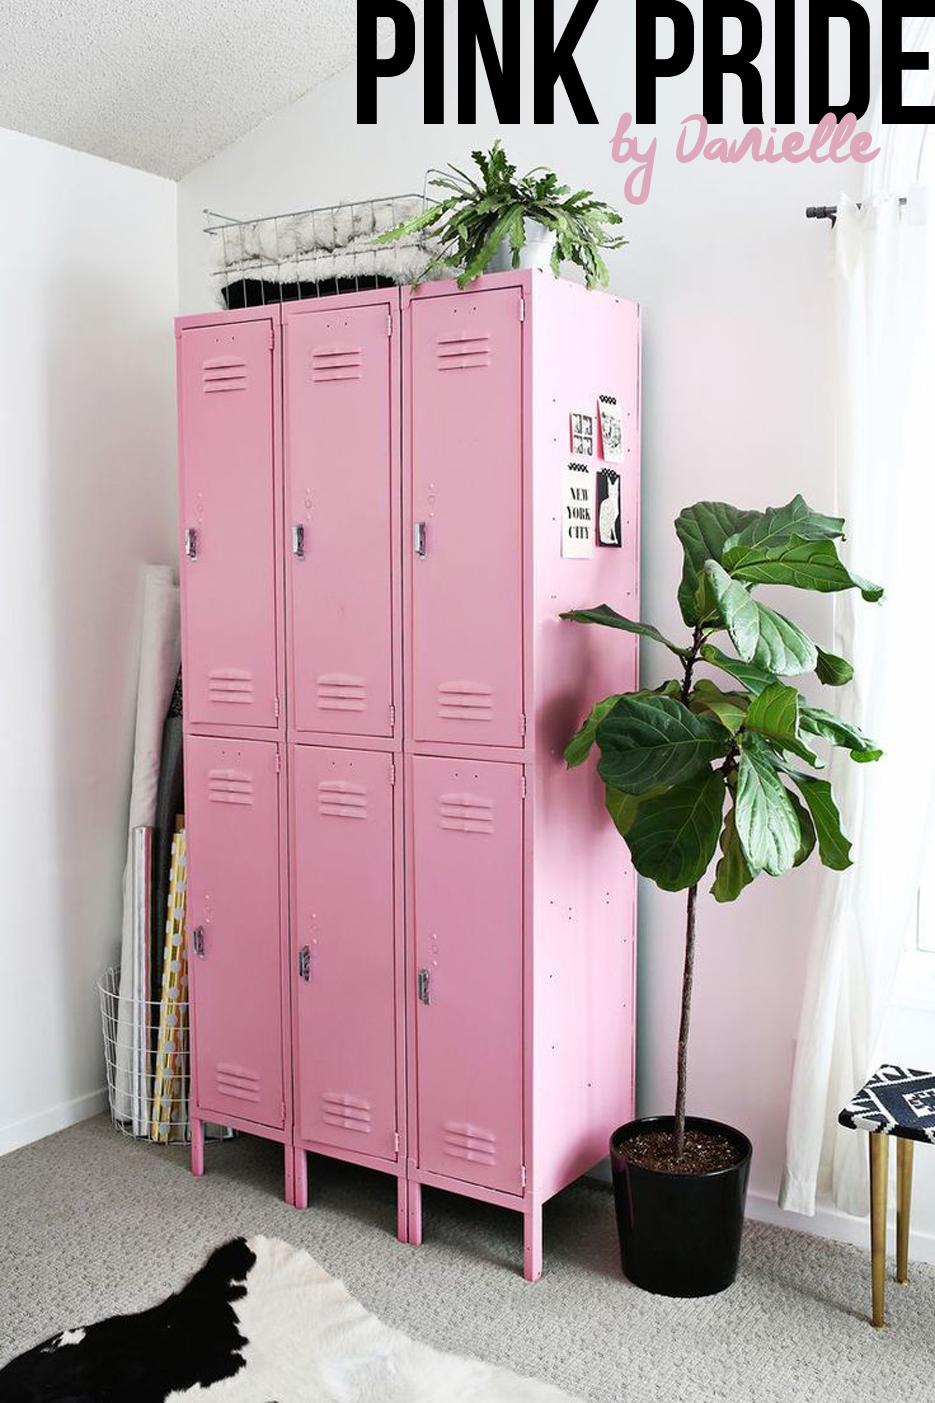 POSE-pink-pride-1